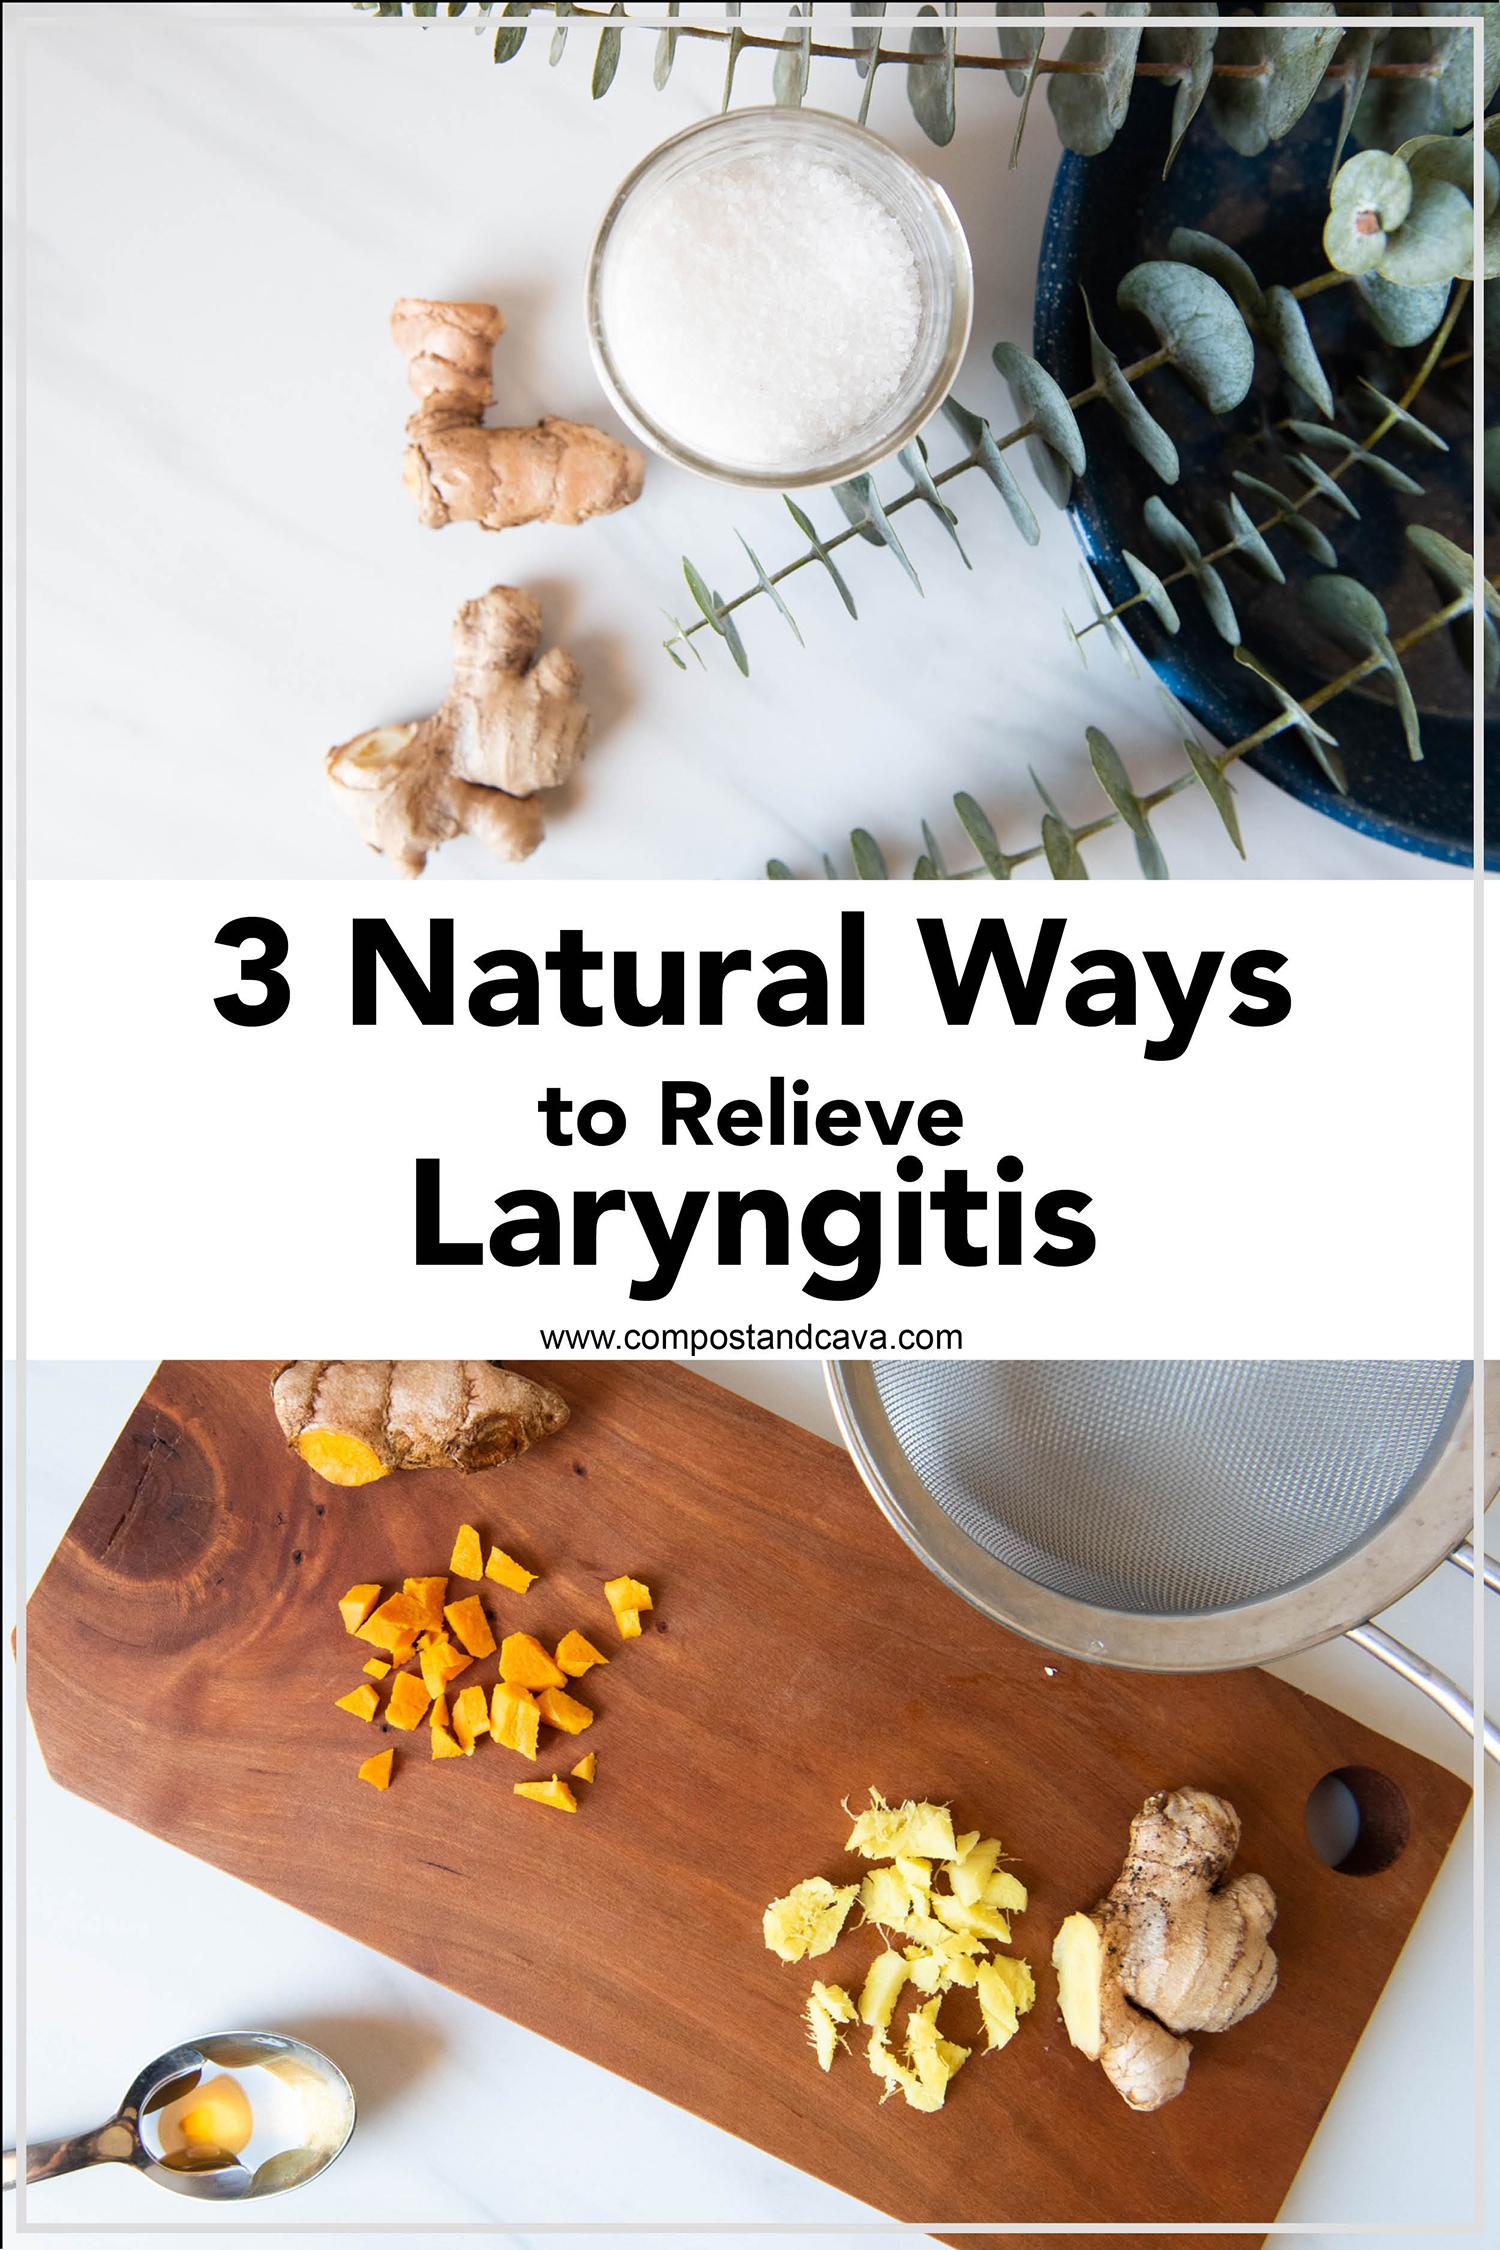 3 Holistic Ways to Relieve Laryngitis